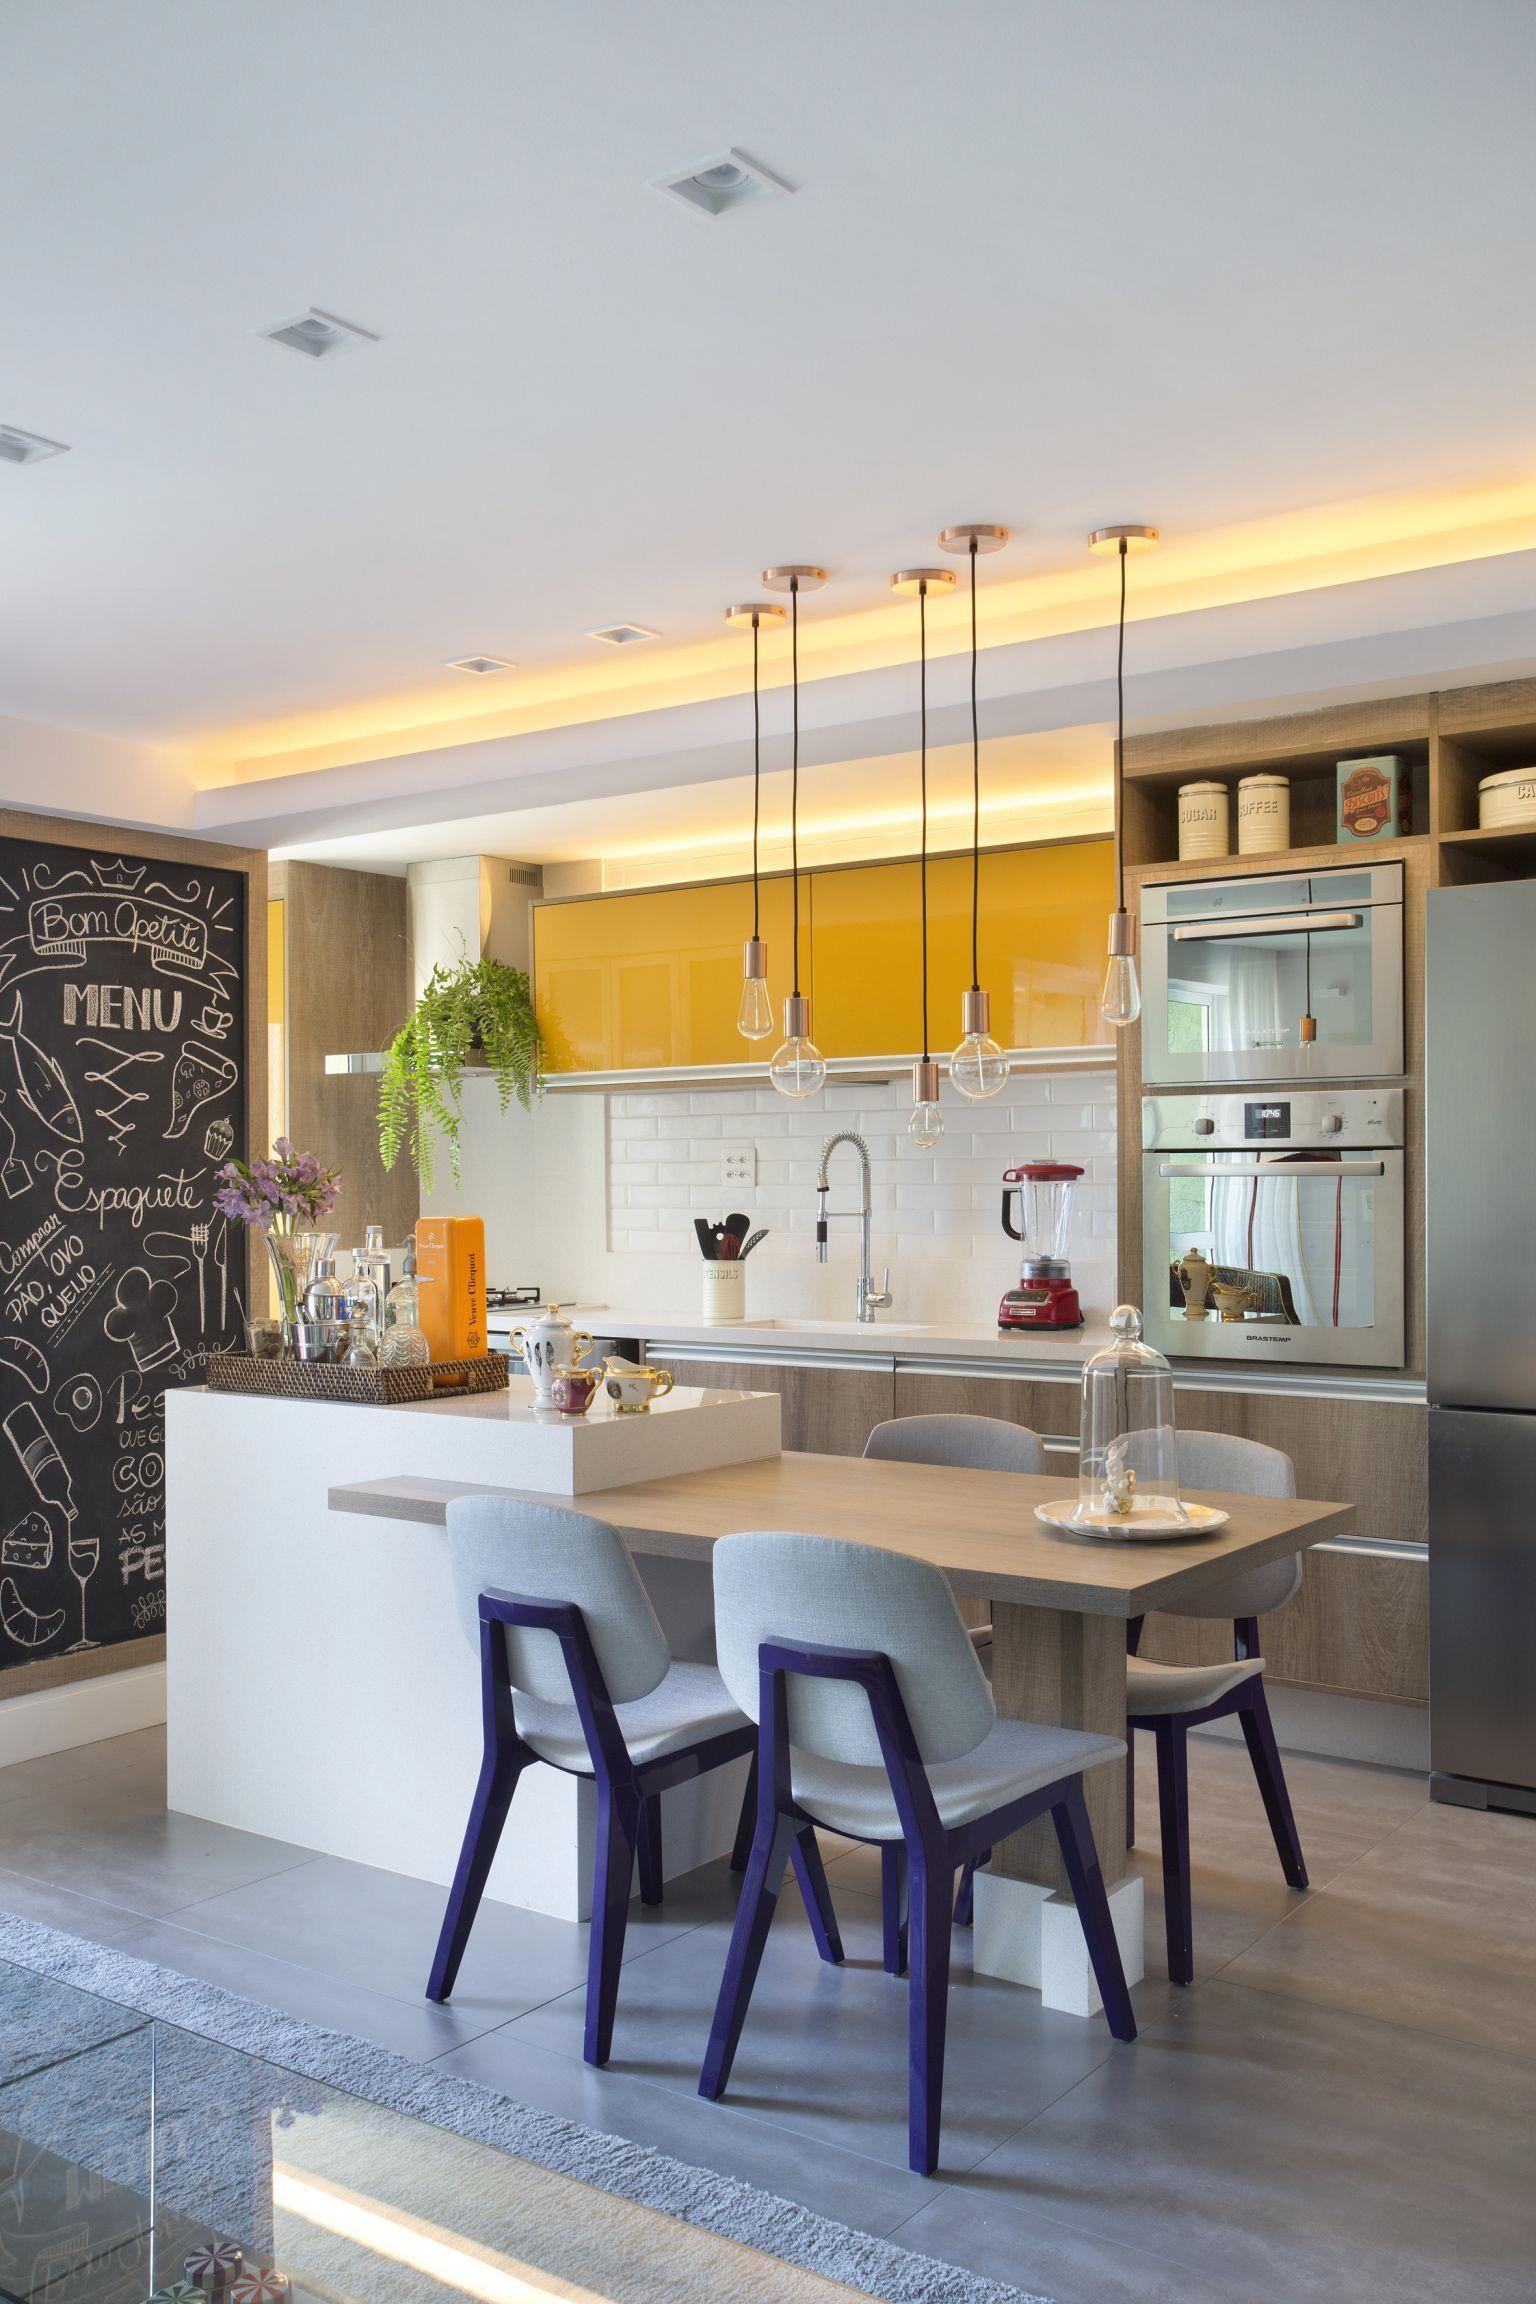 Small Modern Kitchen Modern Small Kitchen Design Kitchen Island Ideas For Small Kitchens Small Small Modern Kitchens Small Space Kitchen Small Kitchen Decor